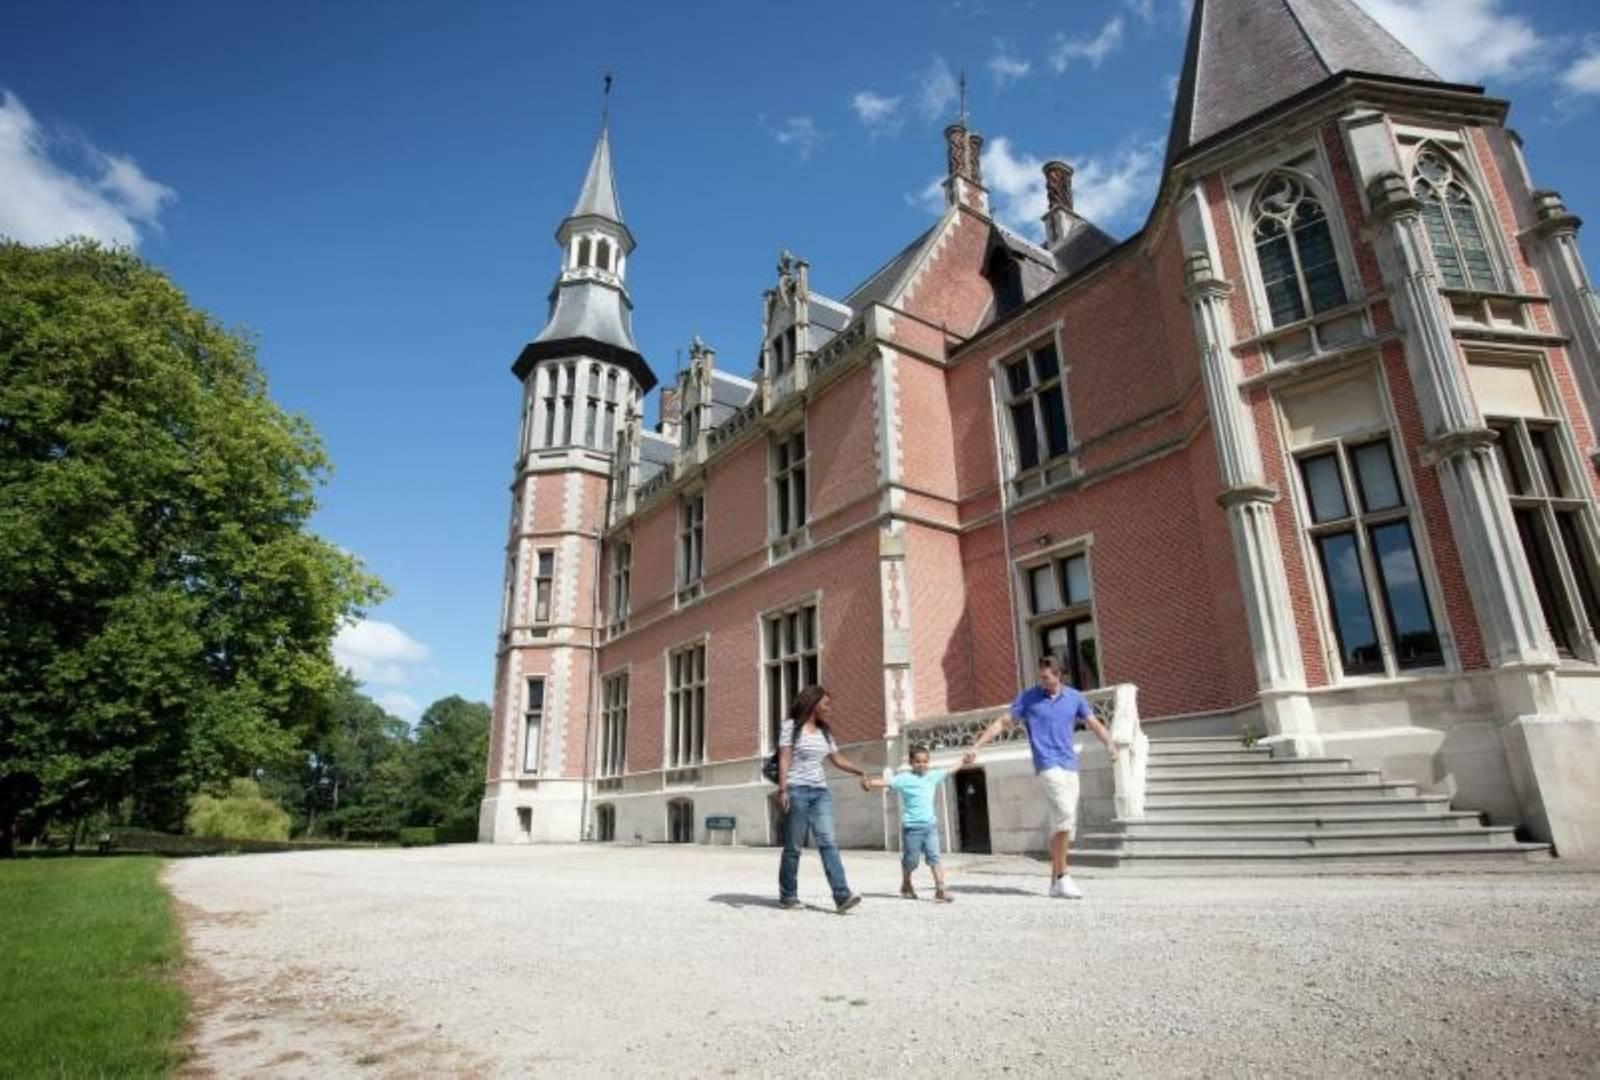 Kasteel D'artrycke - Feestzaal - House of Weddings (9)